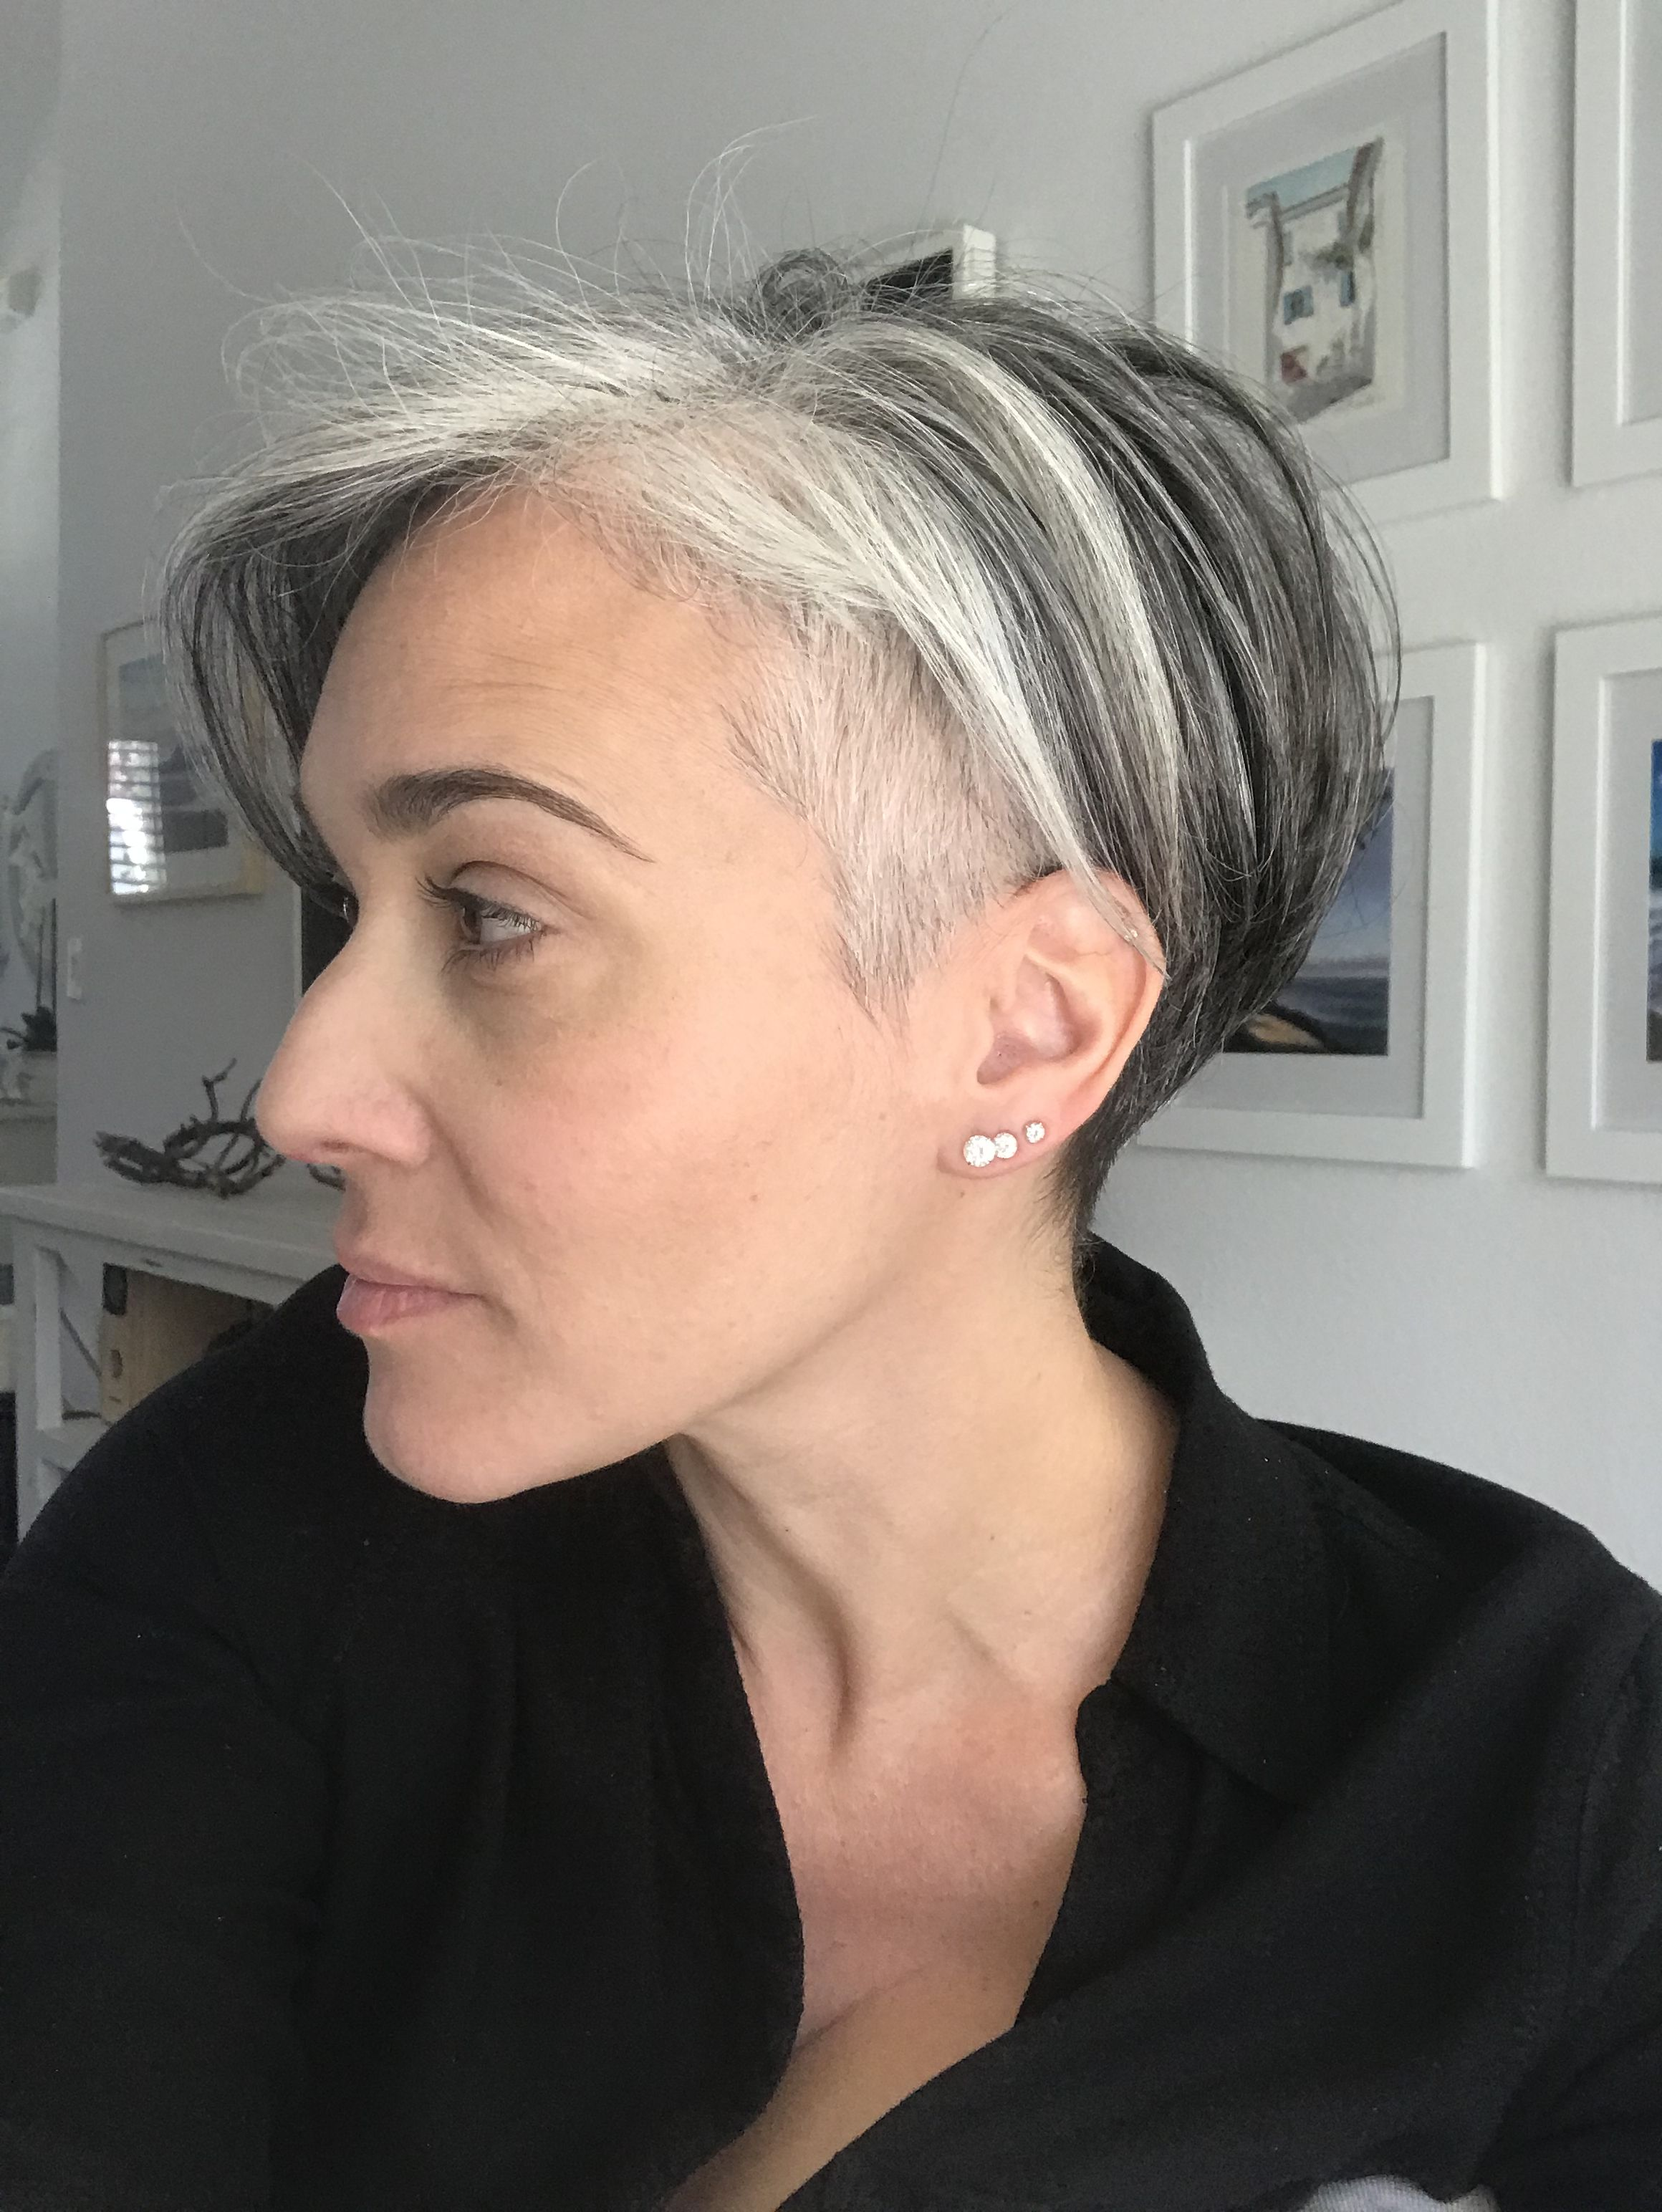 Pin By Rubia Rubita Home On Minha Transicao Para Os Cabelos Brancos Rubia Rubita Gray Hair Beauty Gray Hair Growing Out Short Hair Styles